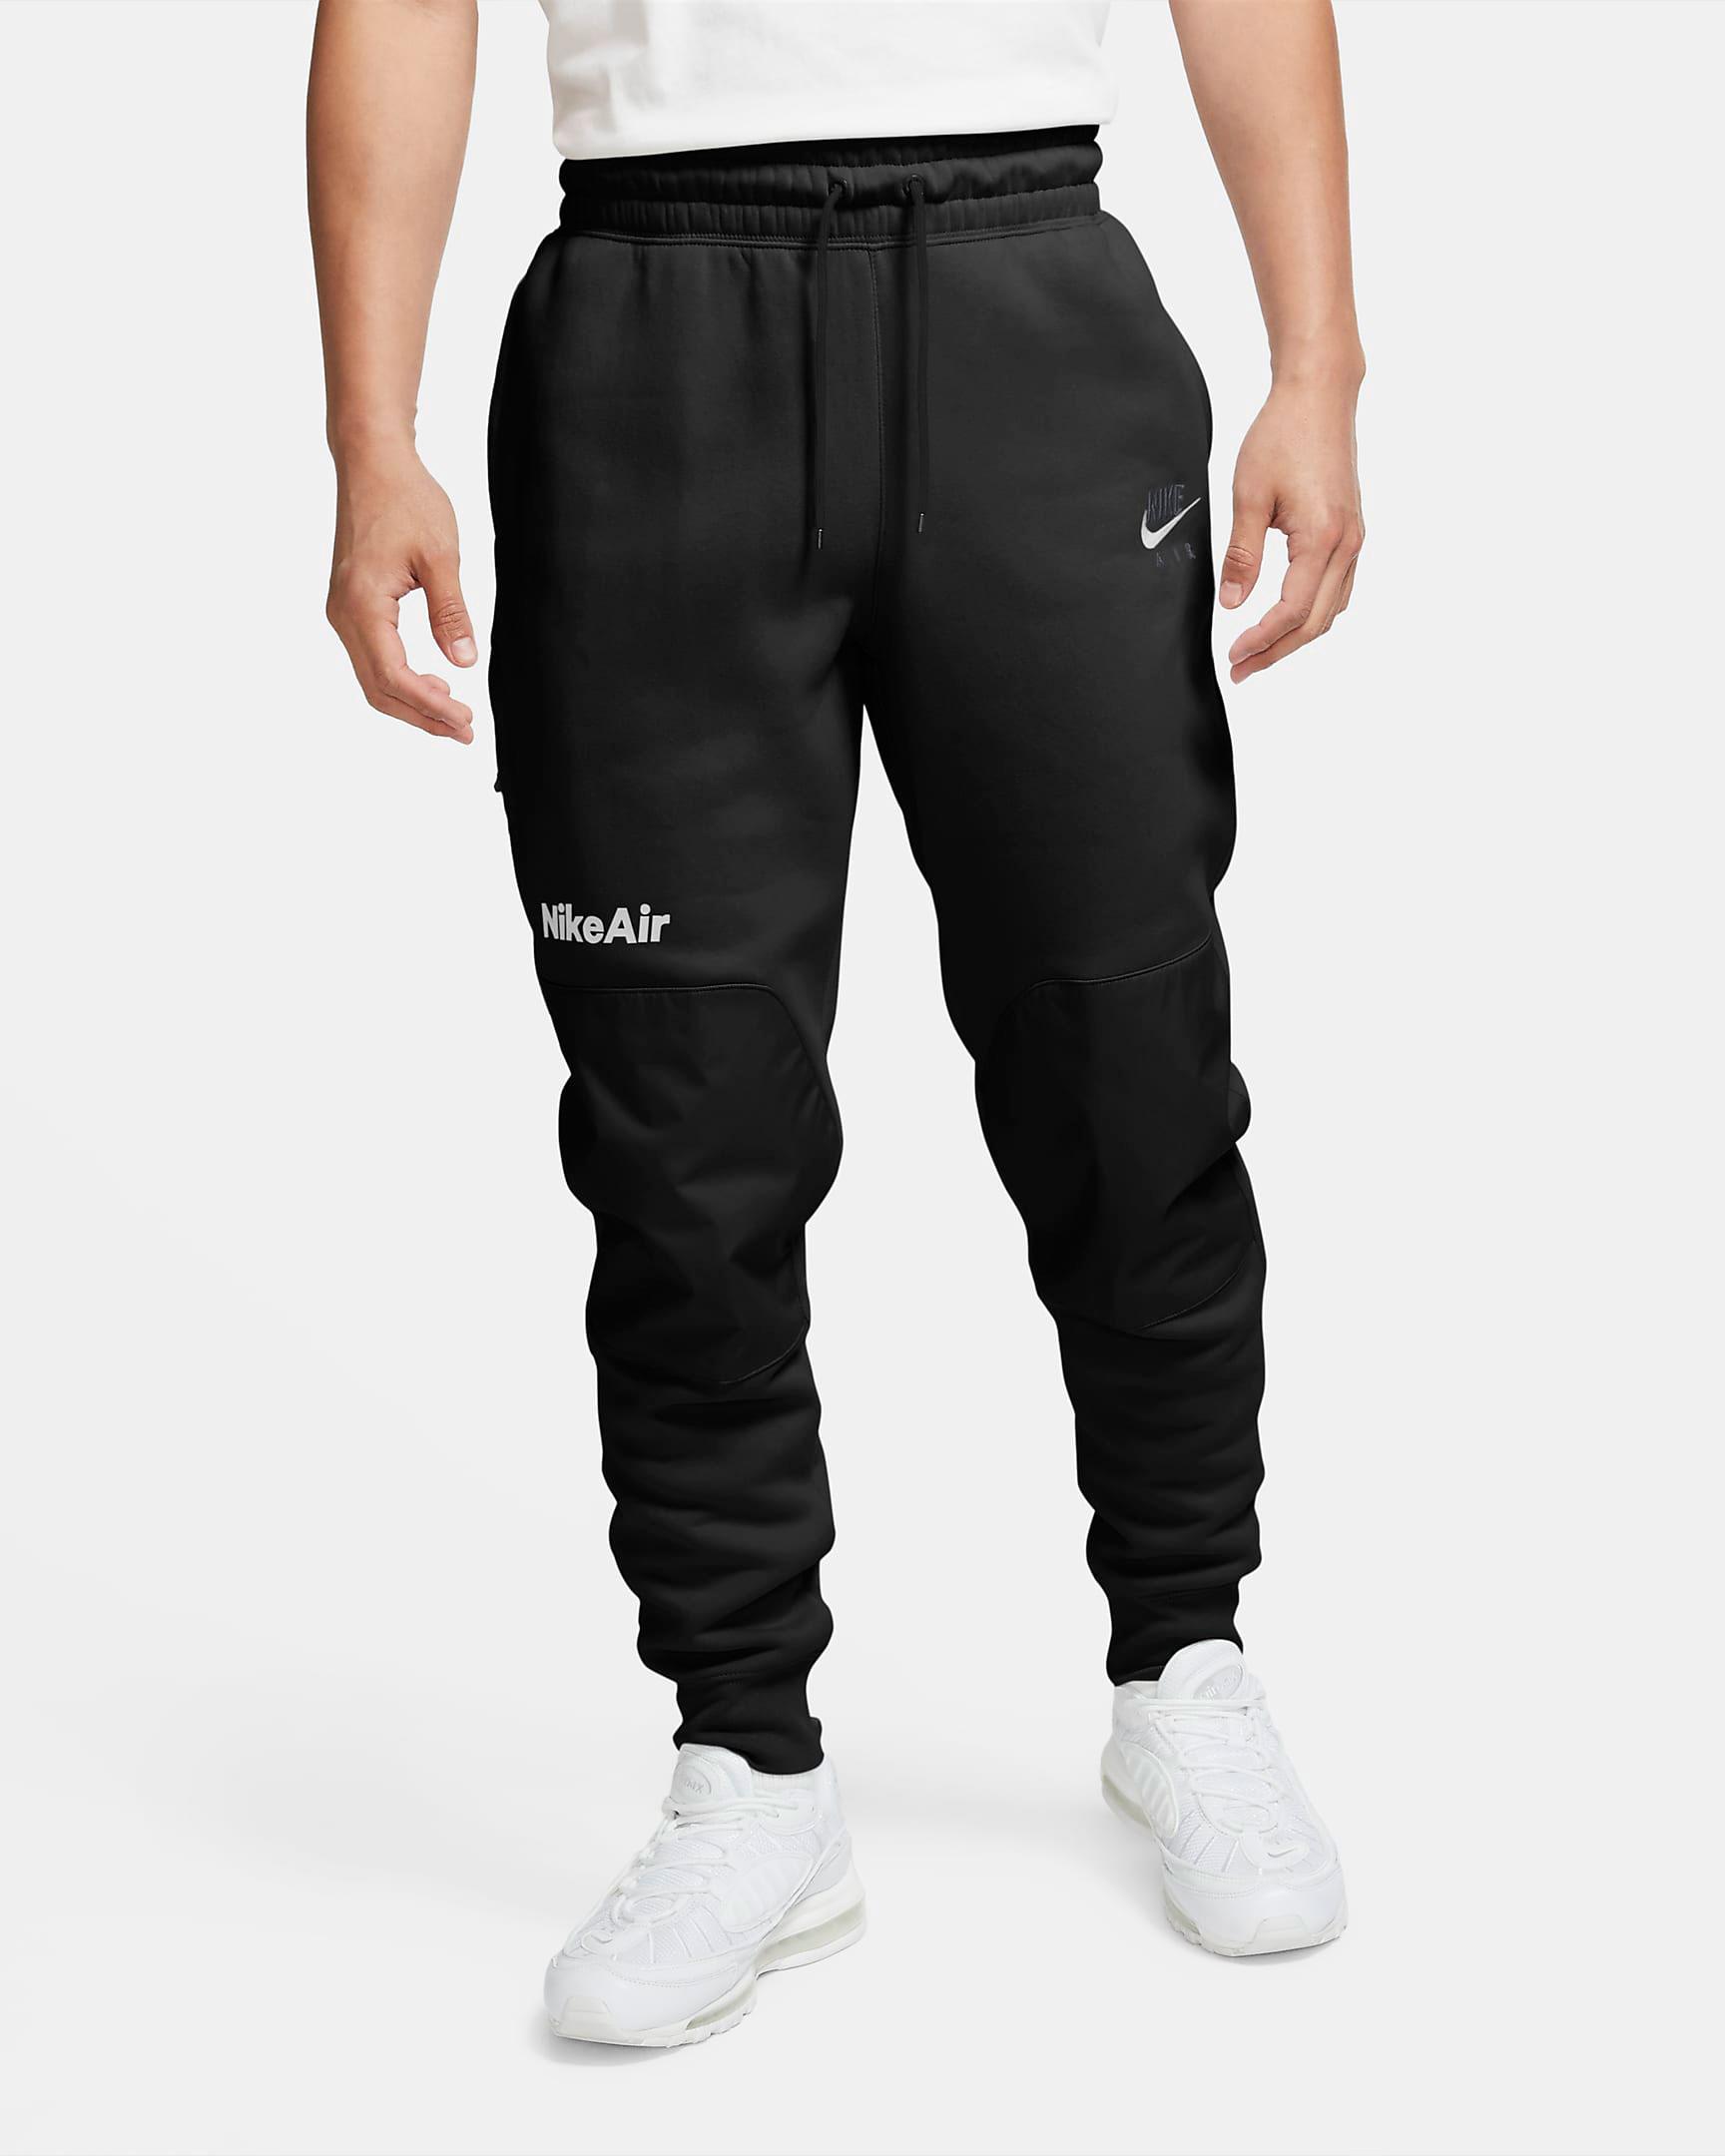 nike-air-fleece-pants-black